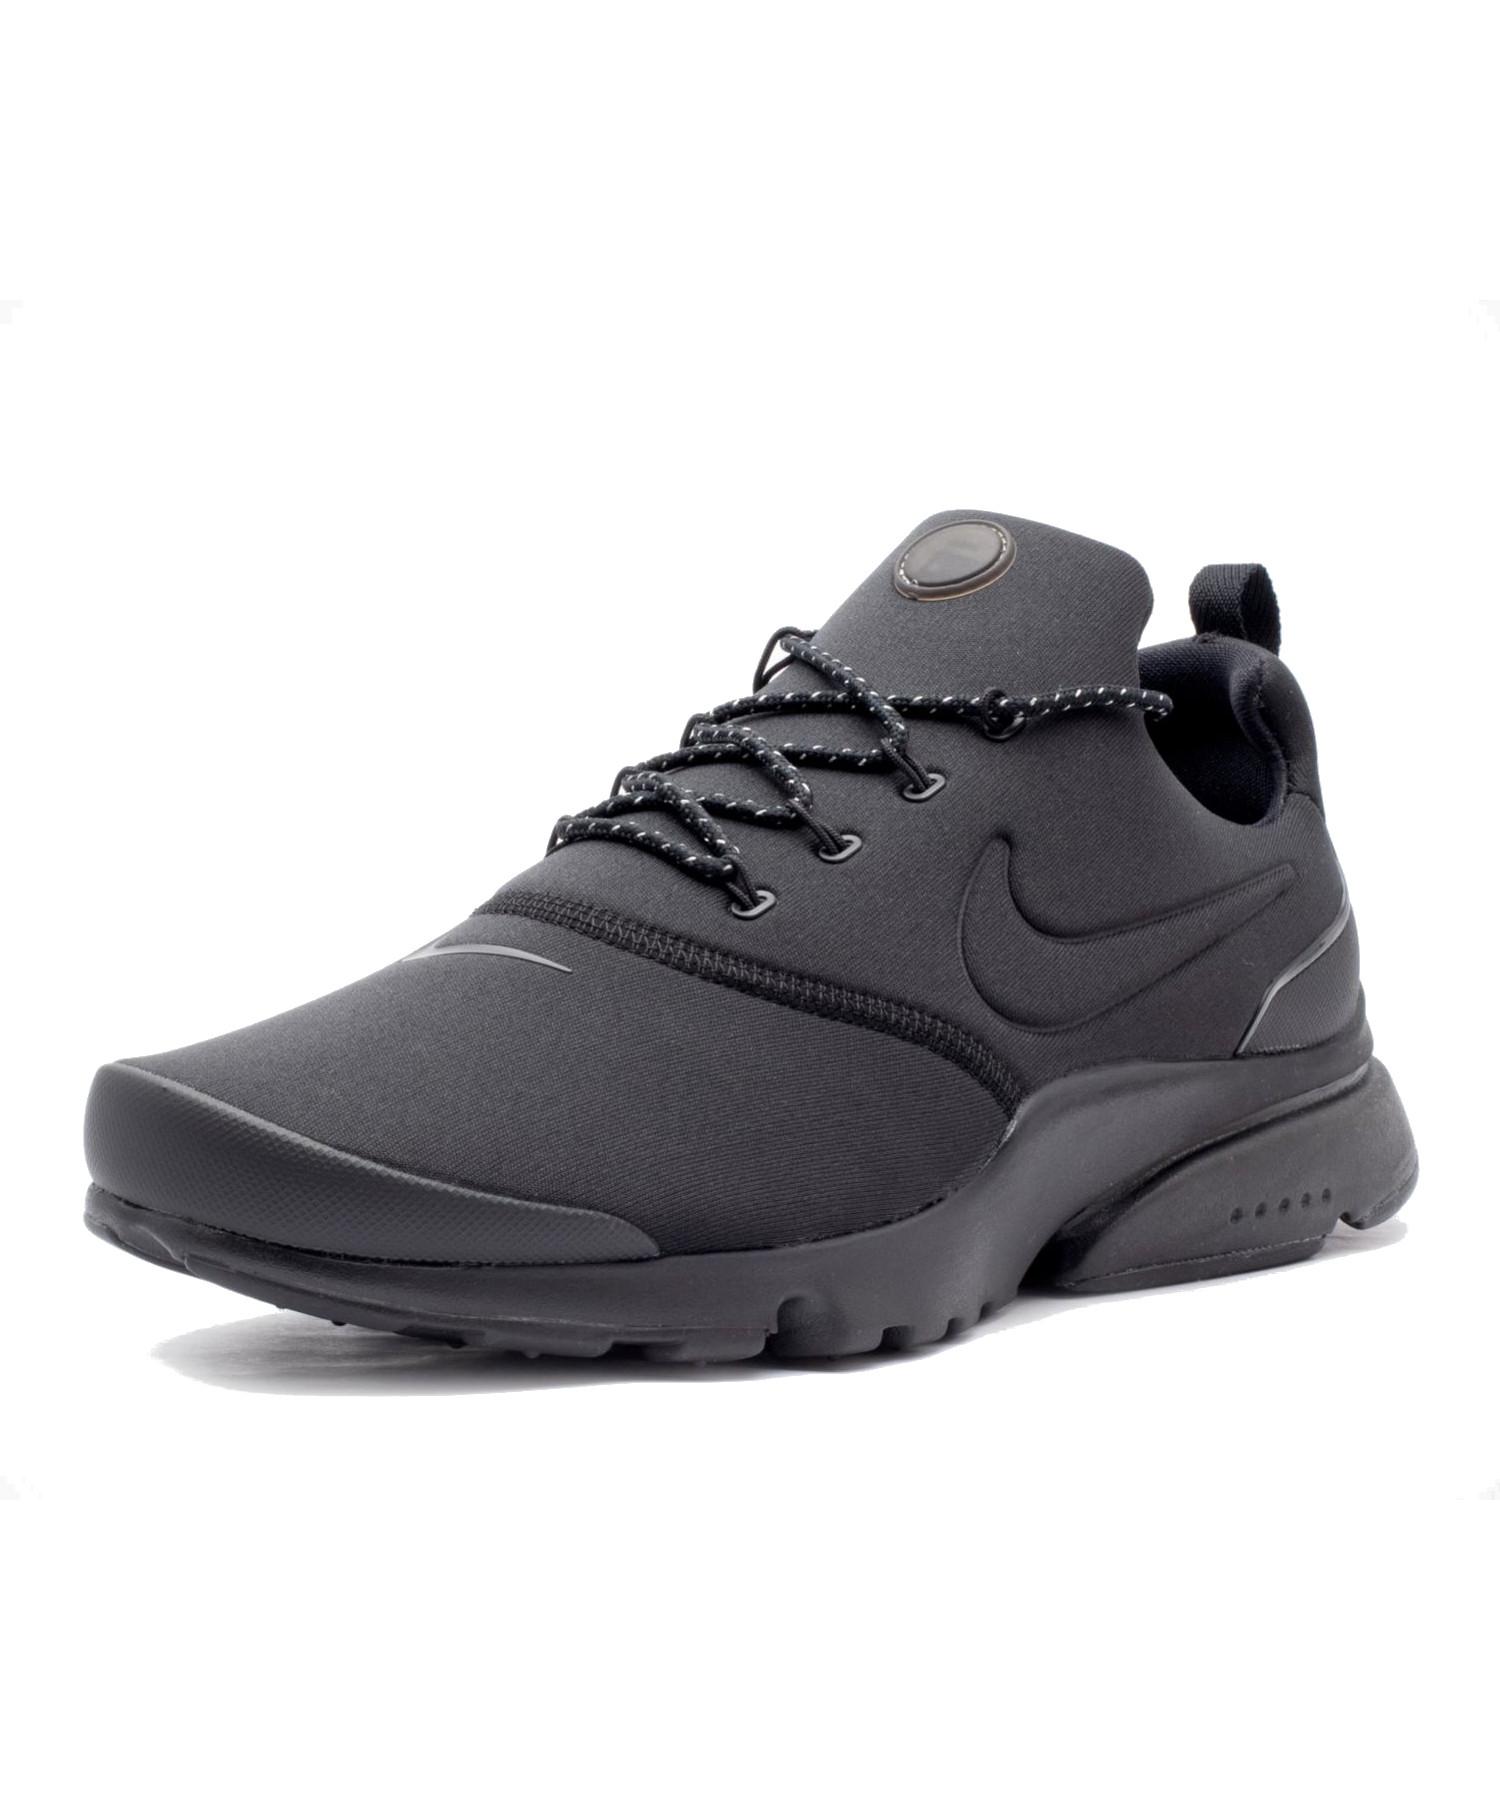 biggest discount buying now cheap for discount Details zu Nike Sport Schuhe Sneakers Shoe Air Bald SE Schwarz 2018 Netz,  Synthetik